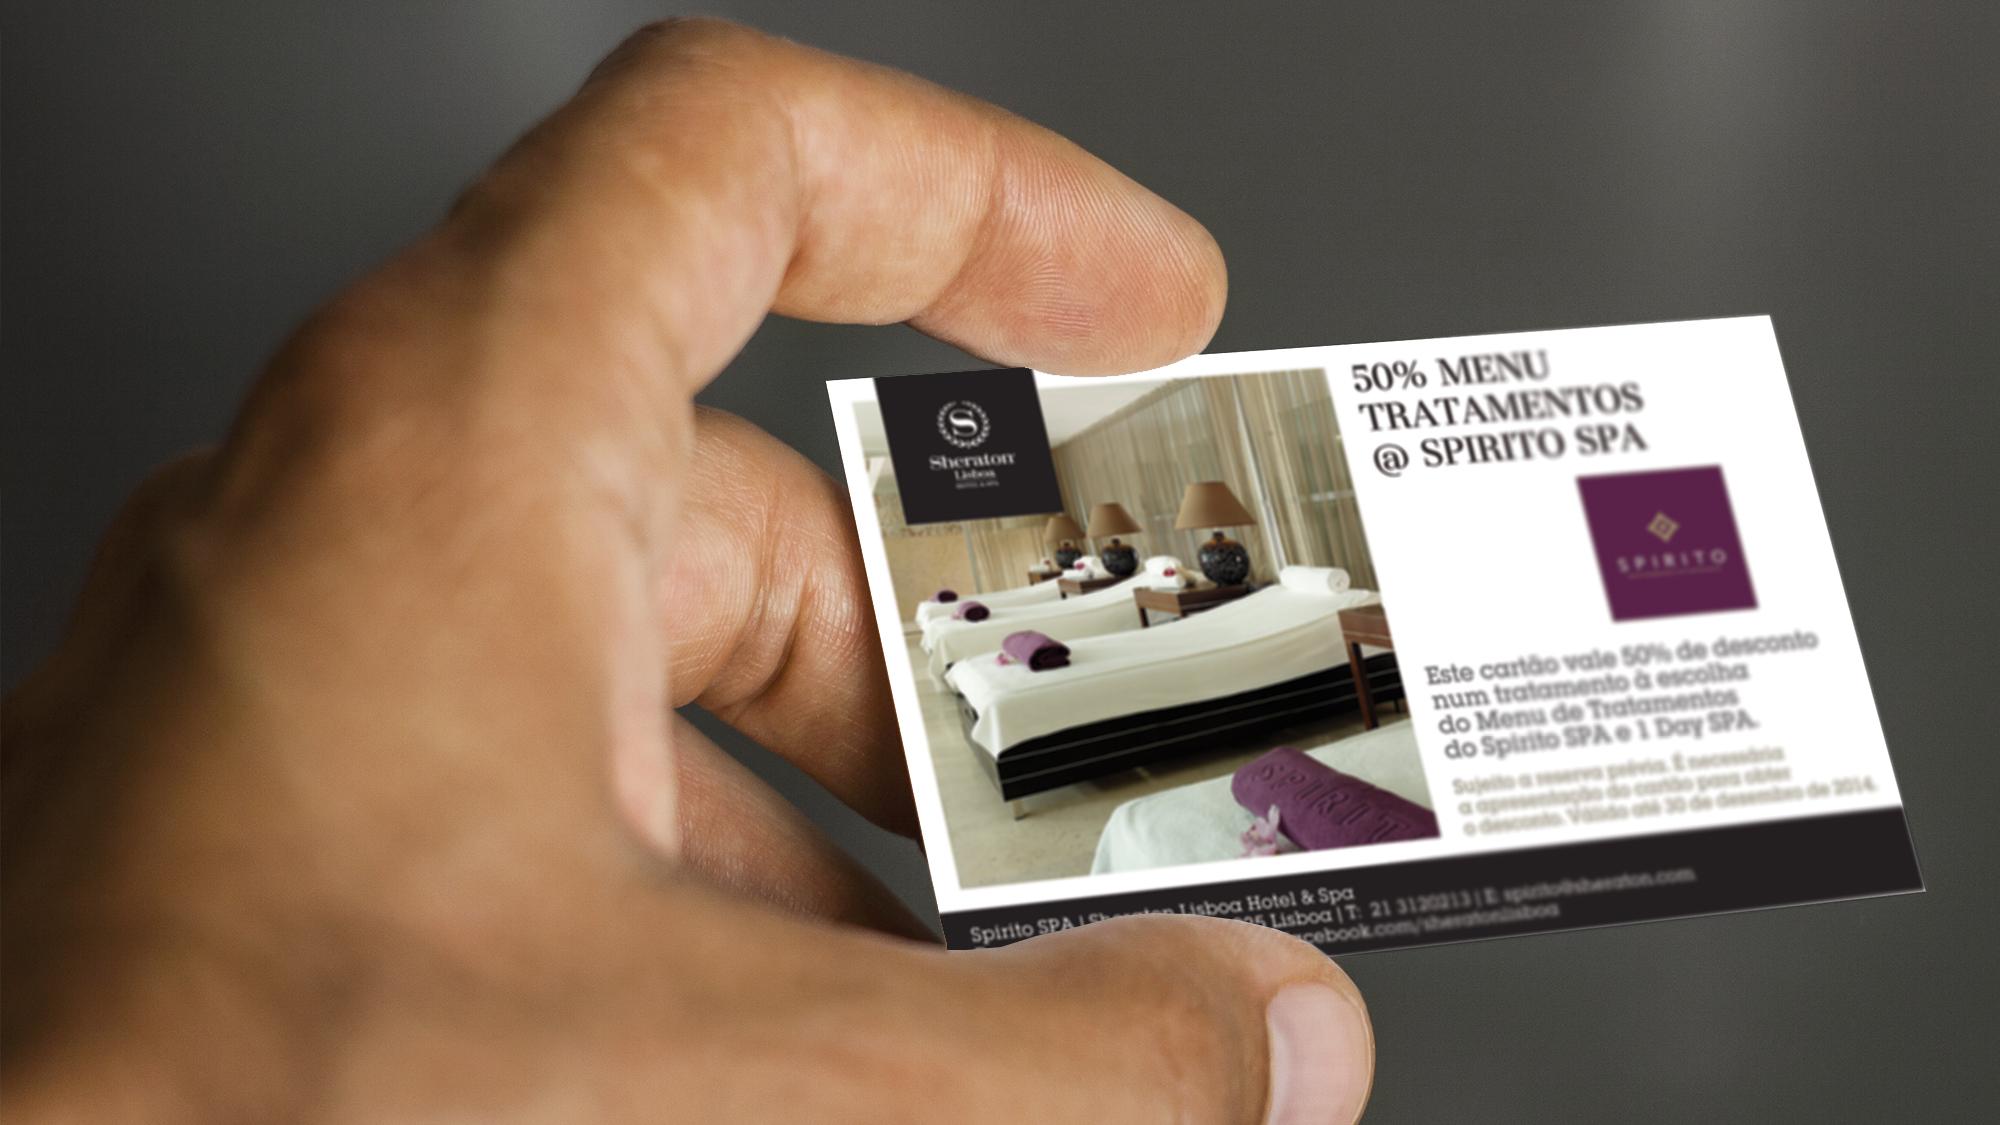 Sheraton Lisboa Hotel & Spa | Vouchers comerciais